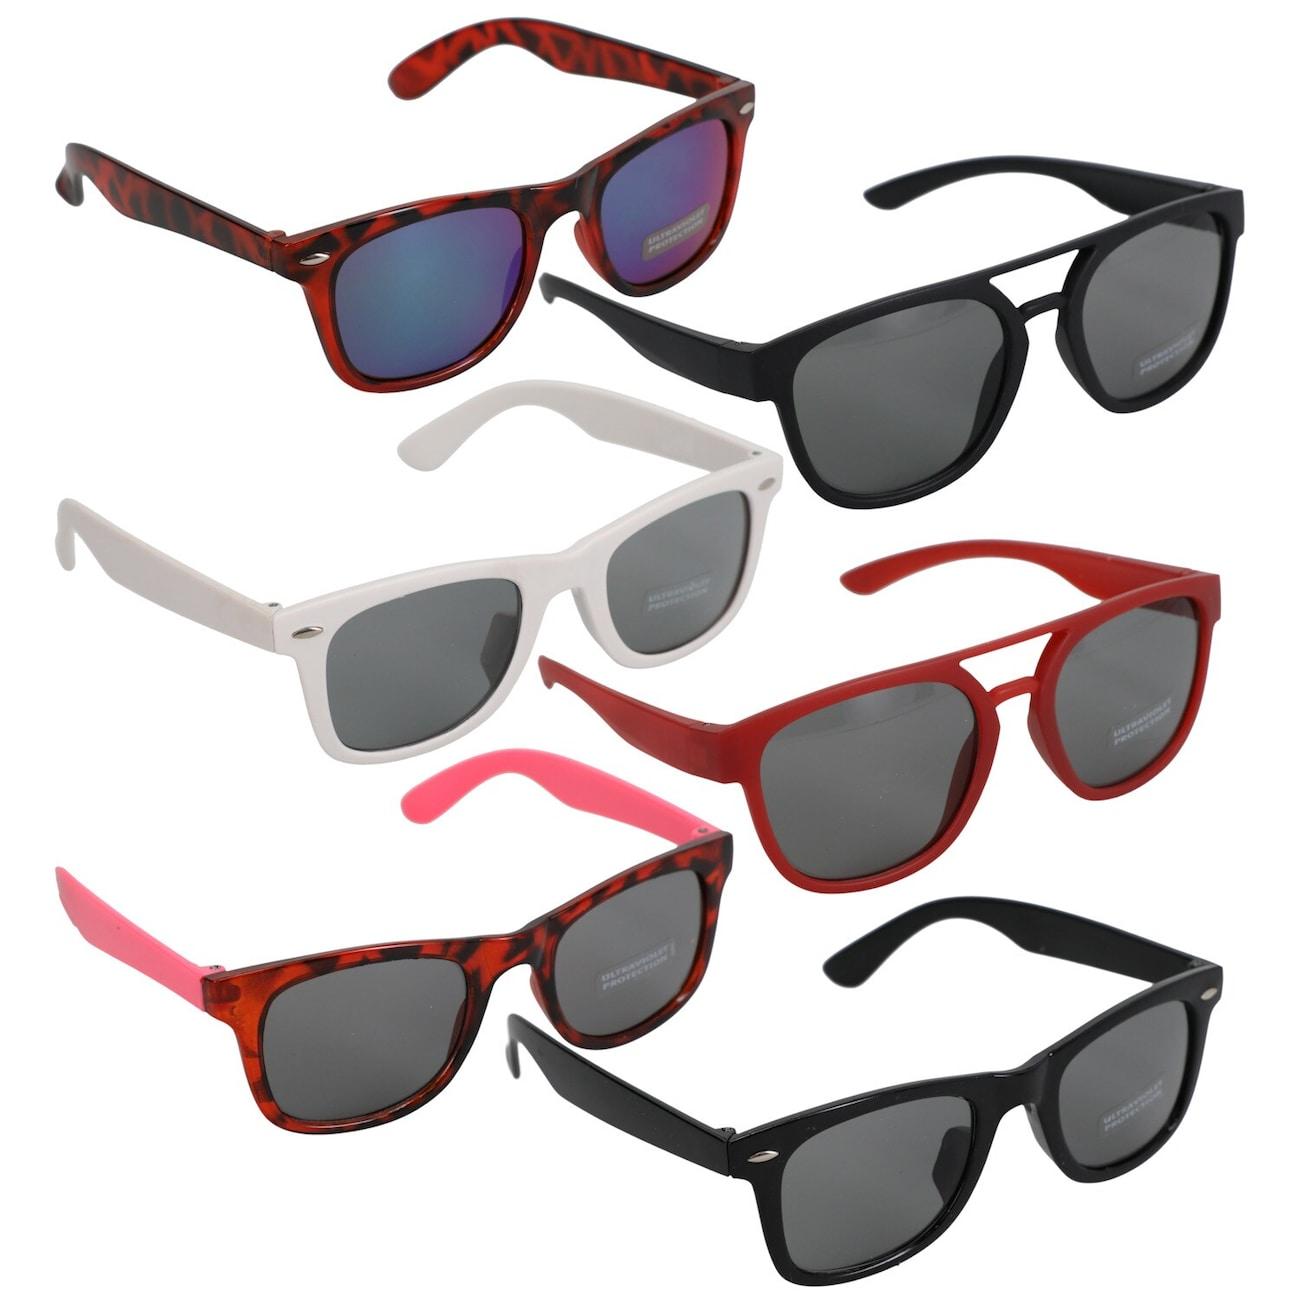 DollarTree com | Bulk Sunscreen & Sunglasses